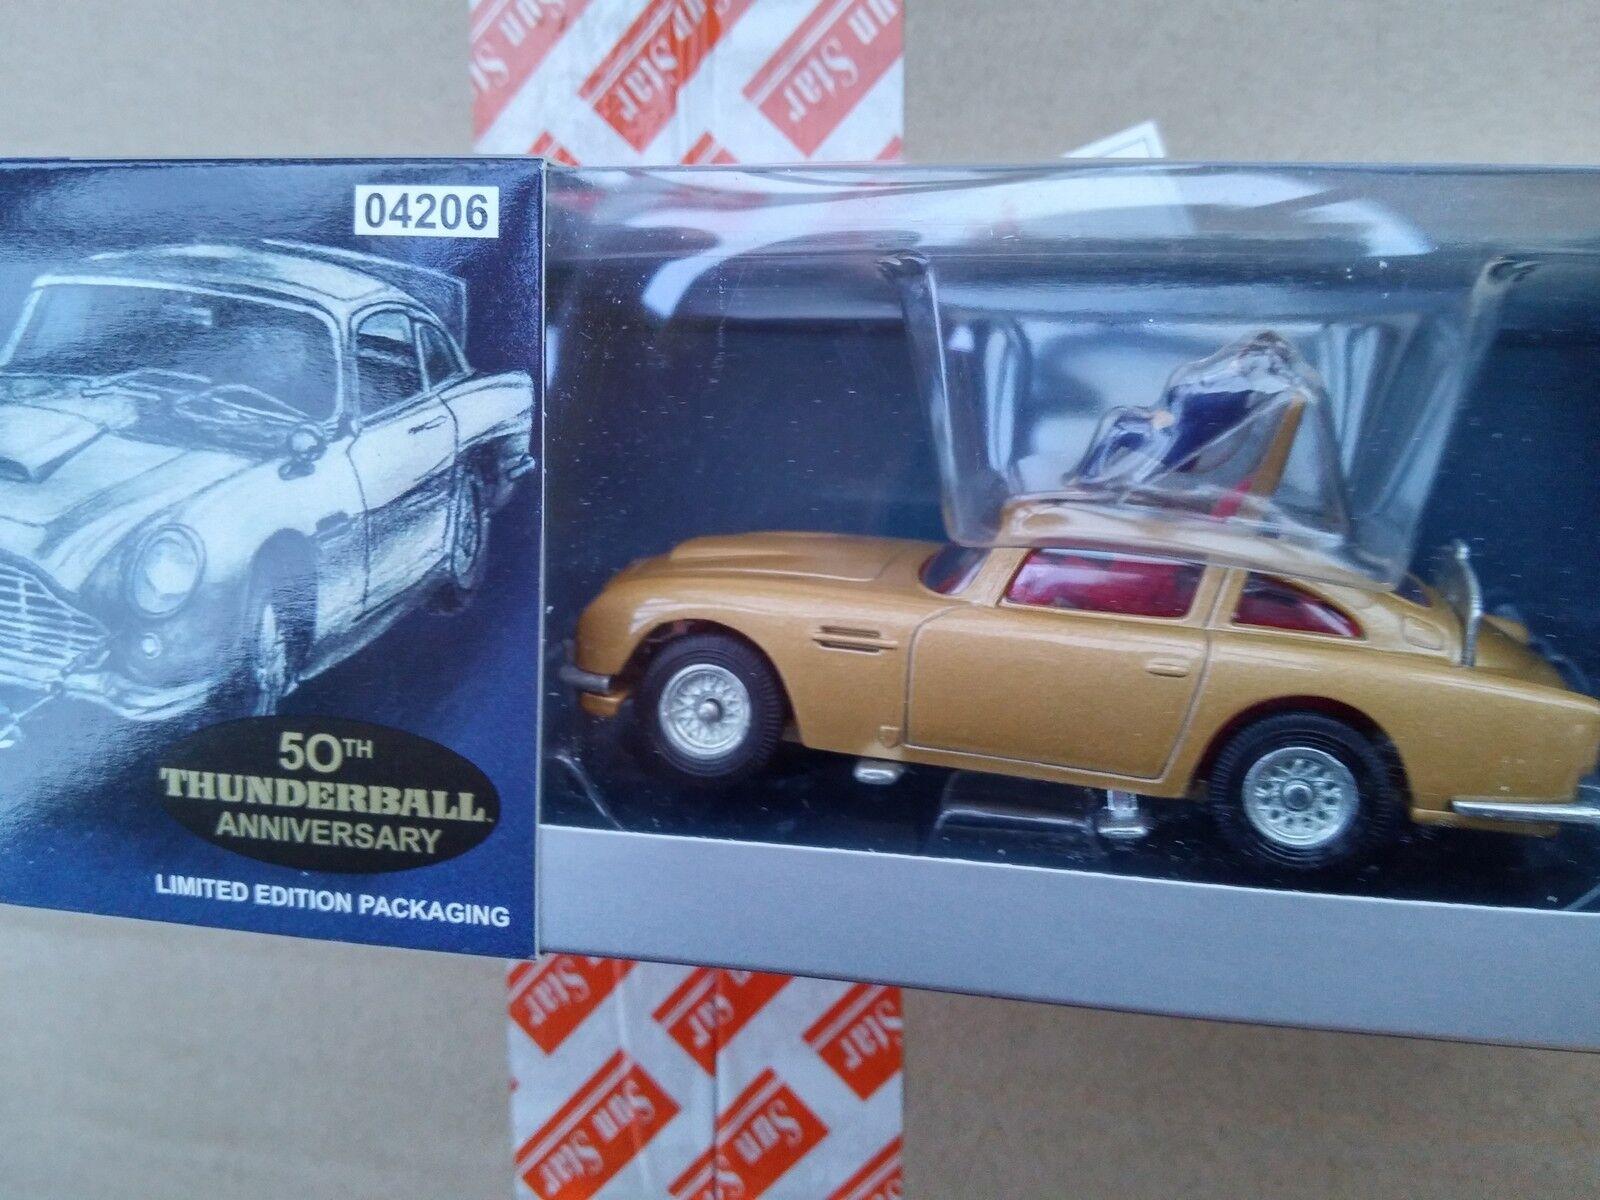 CORGI CORGI CORGI cc04206g & cc04206s ASTON MARTIN DB5 JAMES BOND 007 THUNDERBALL Pellicola SP 18 c58e11